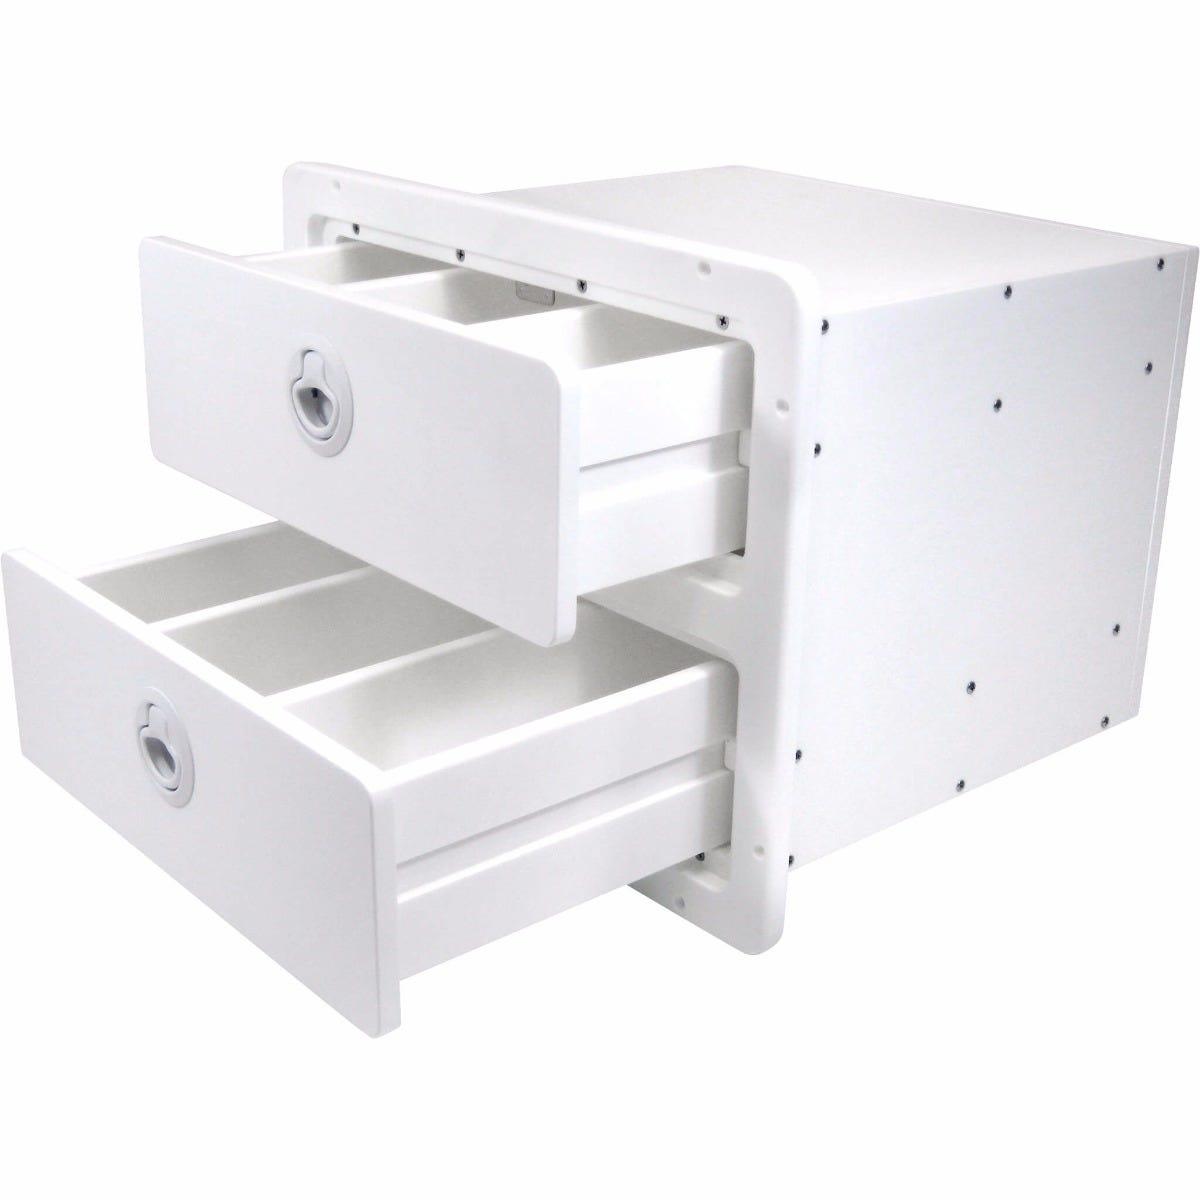 alex white drawers under clothes organizer desk unit fresh of attachment units drawer craft